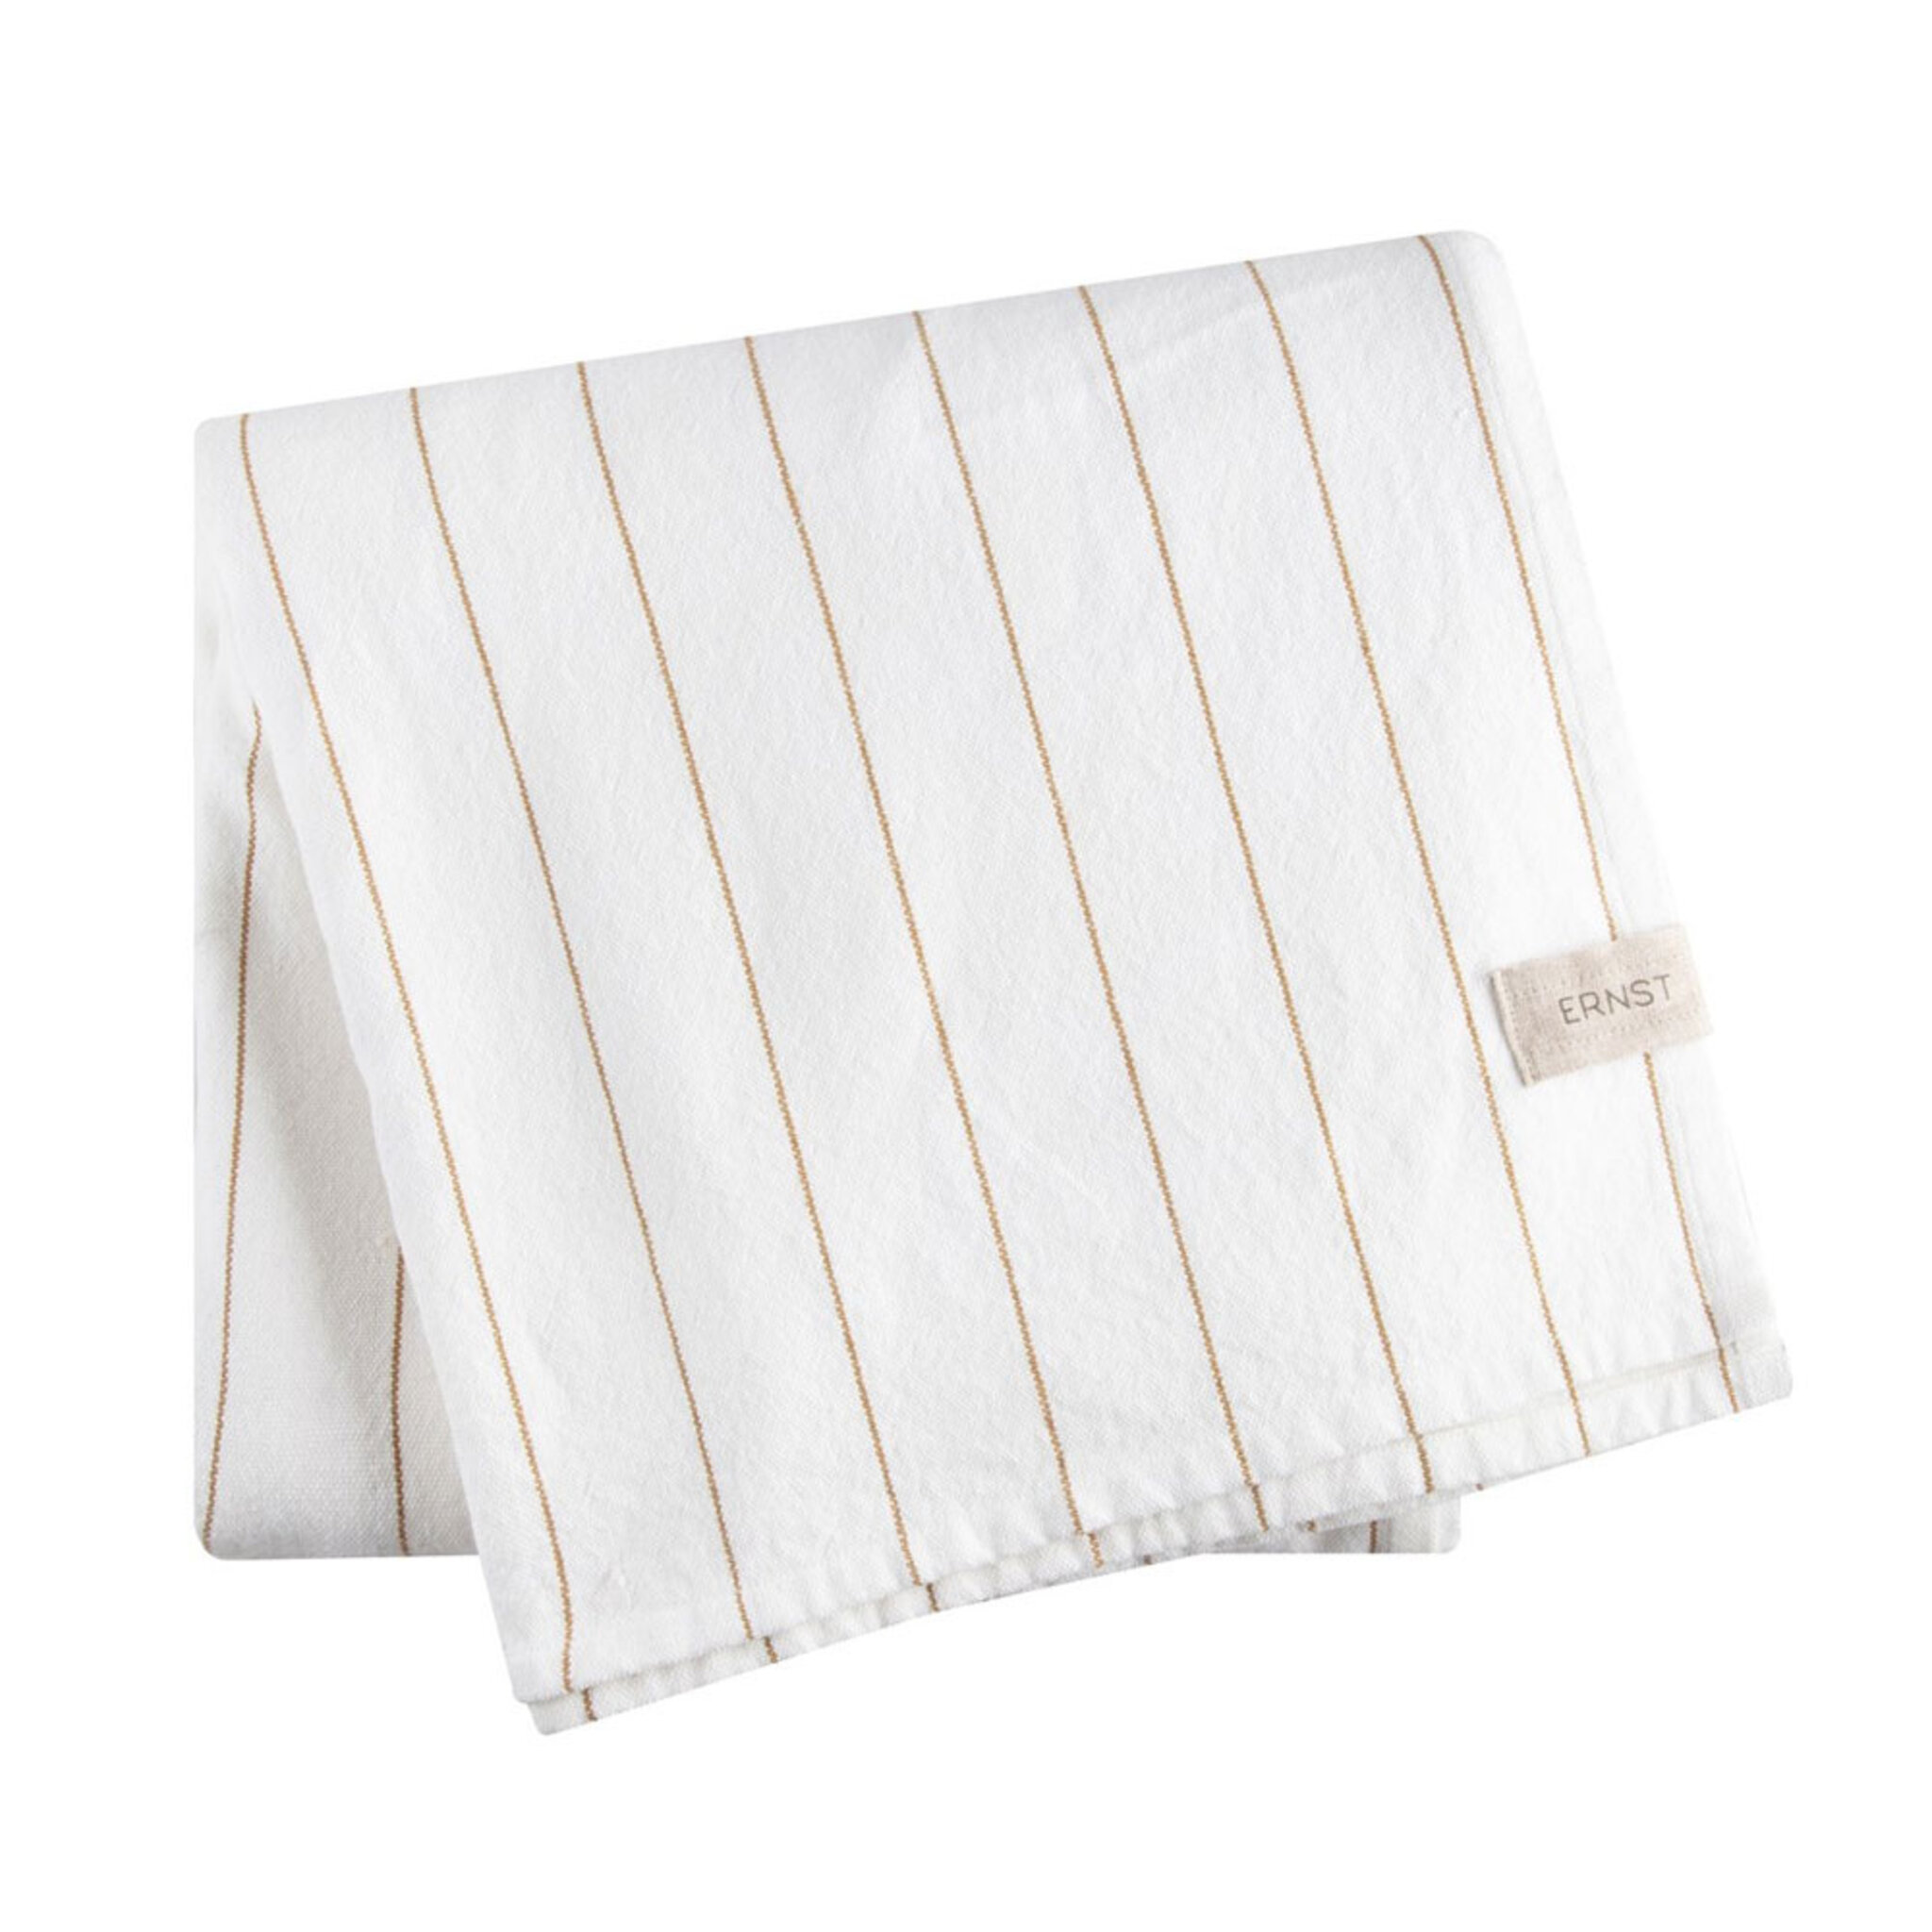 Bordsduk Randig 140×300 cm